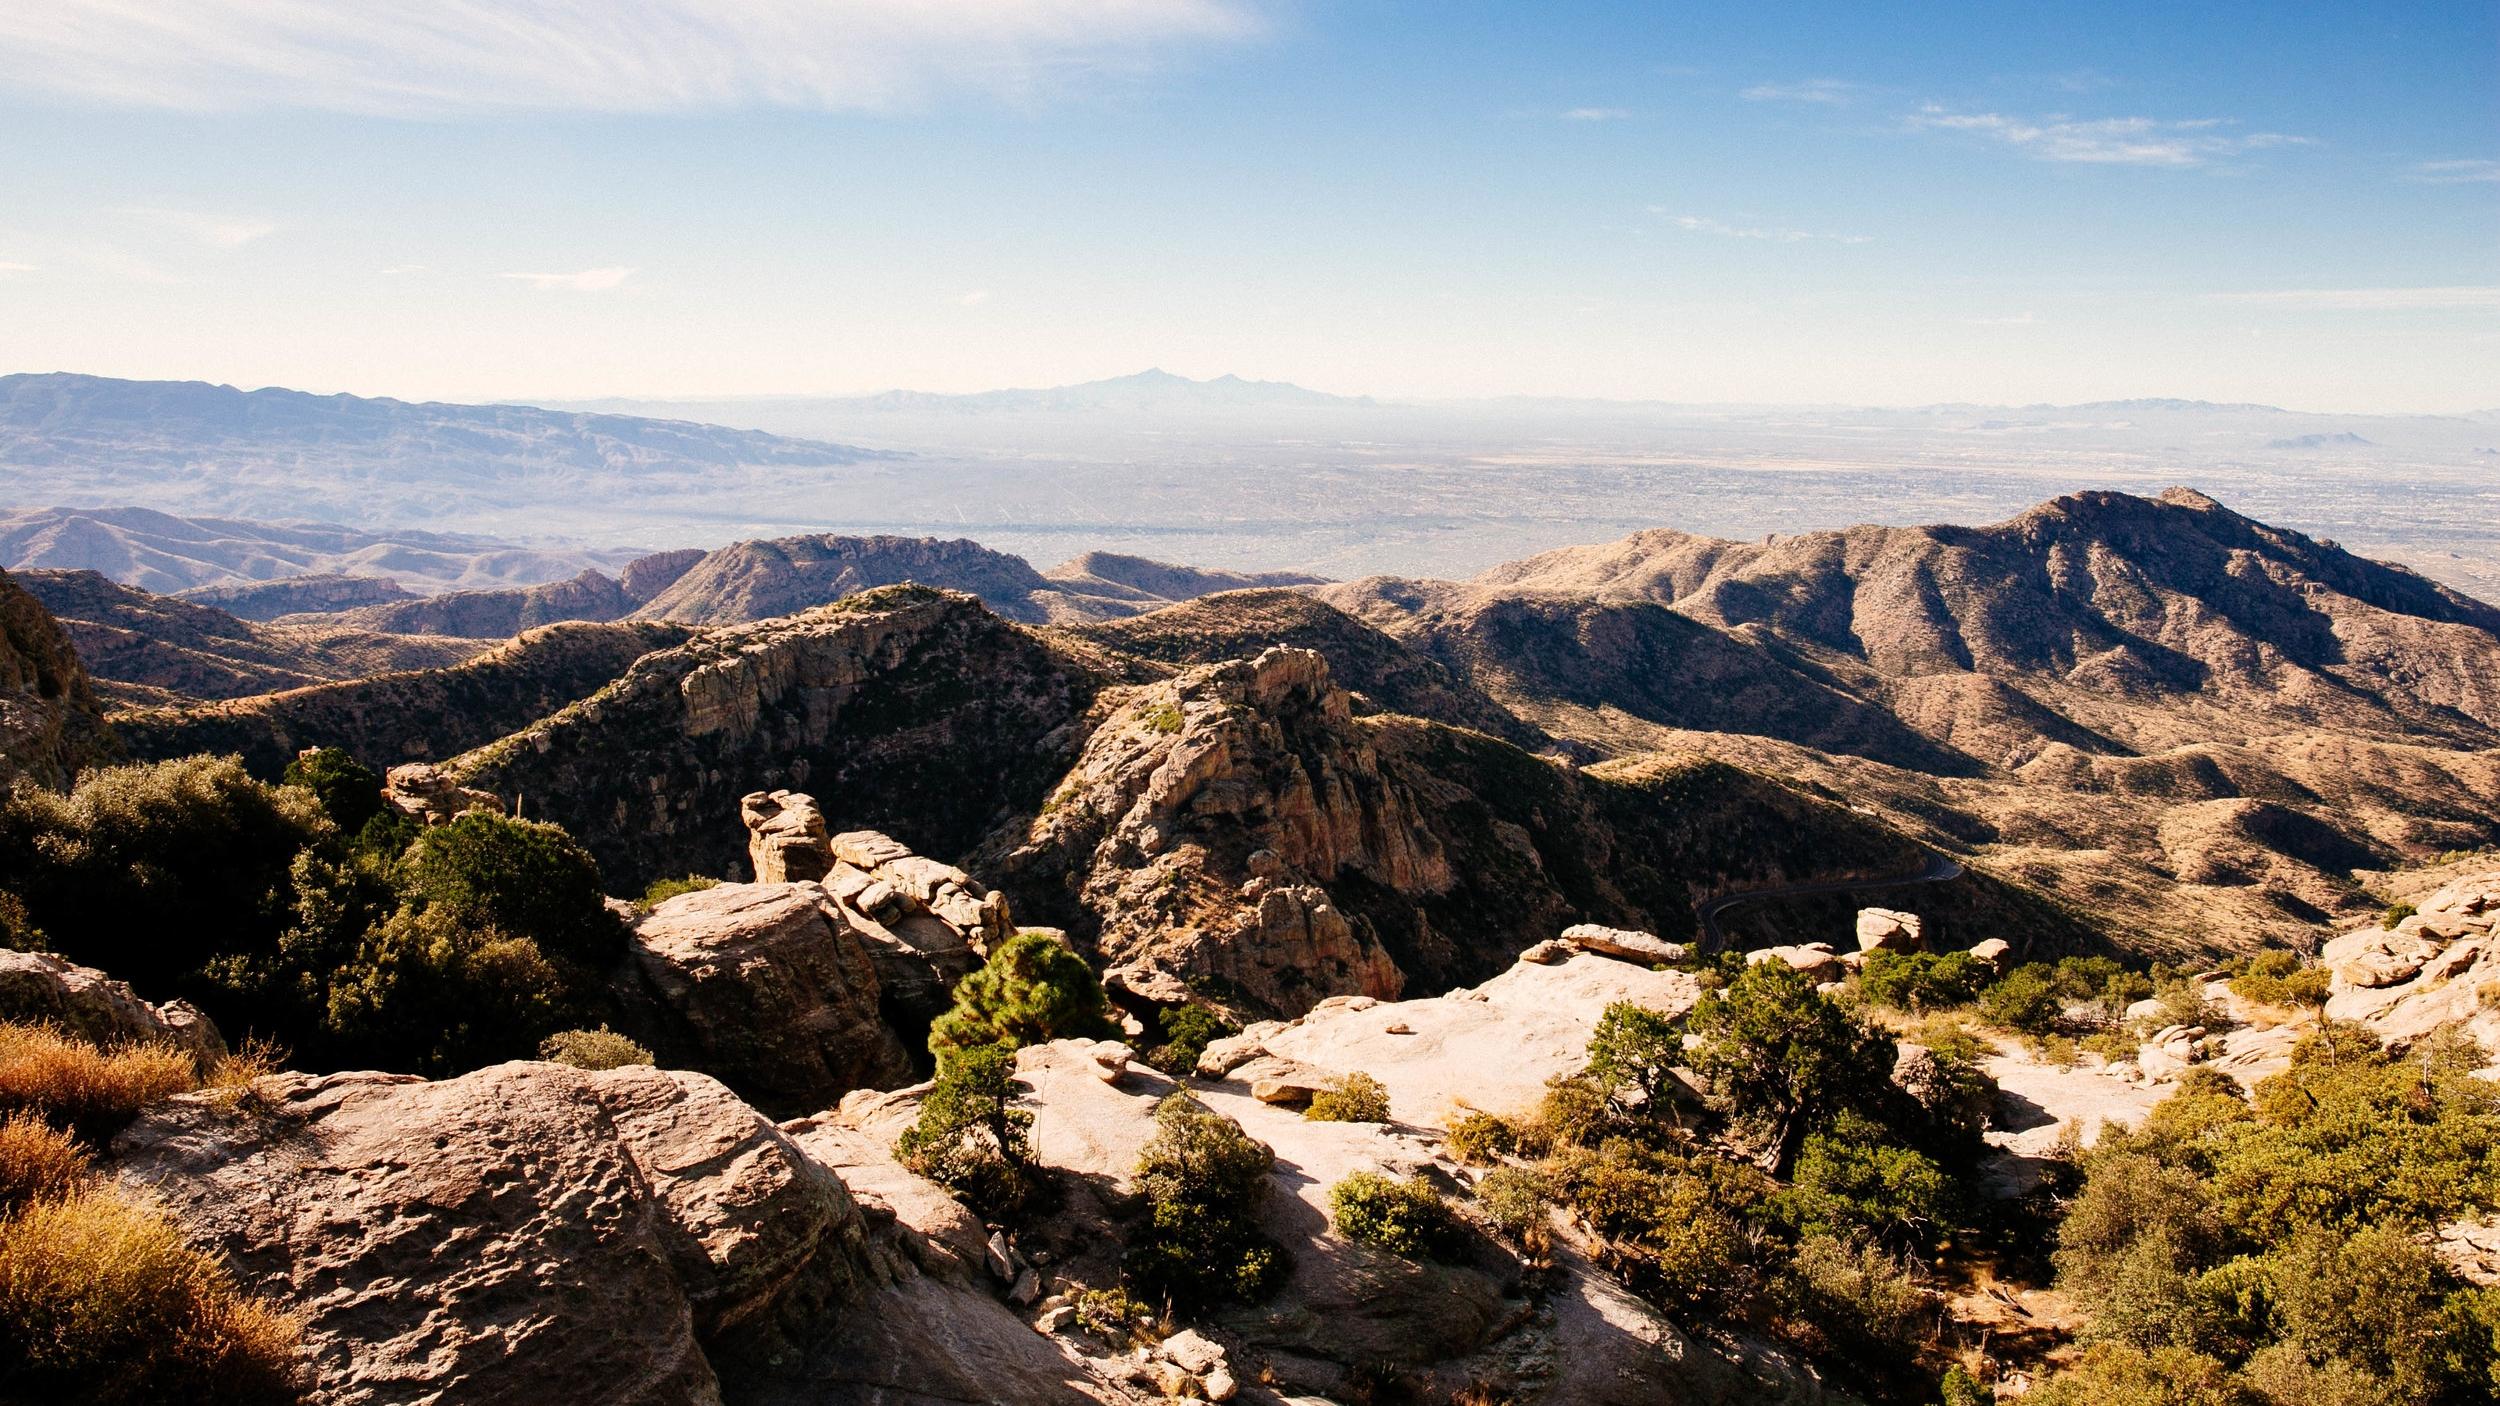 Mt Lemmon Tucson Arizona